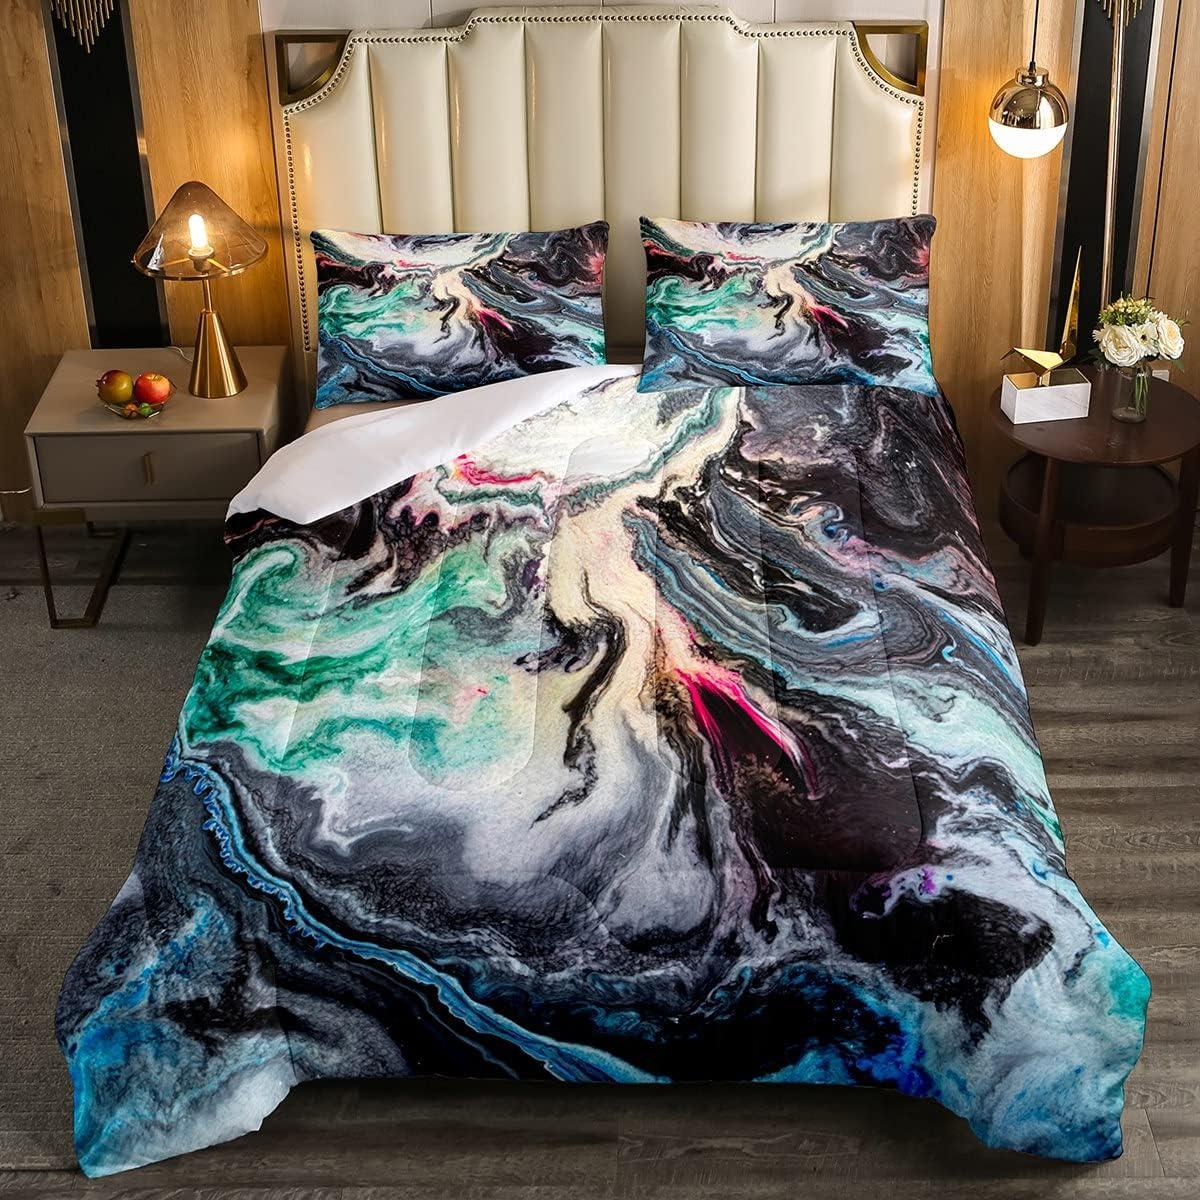 Erosebridal Black It is New popularity very popular Marble Bedding Psychedelic Comforte Set